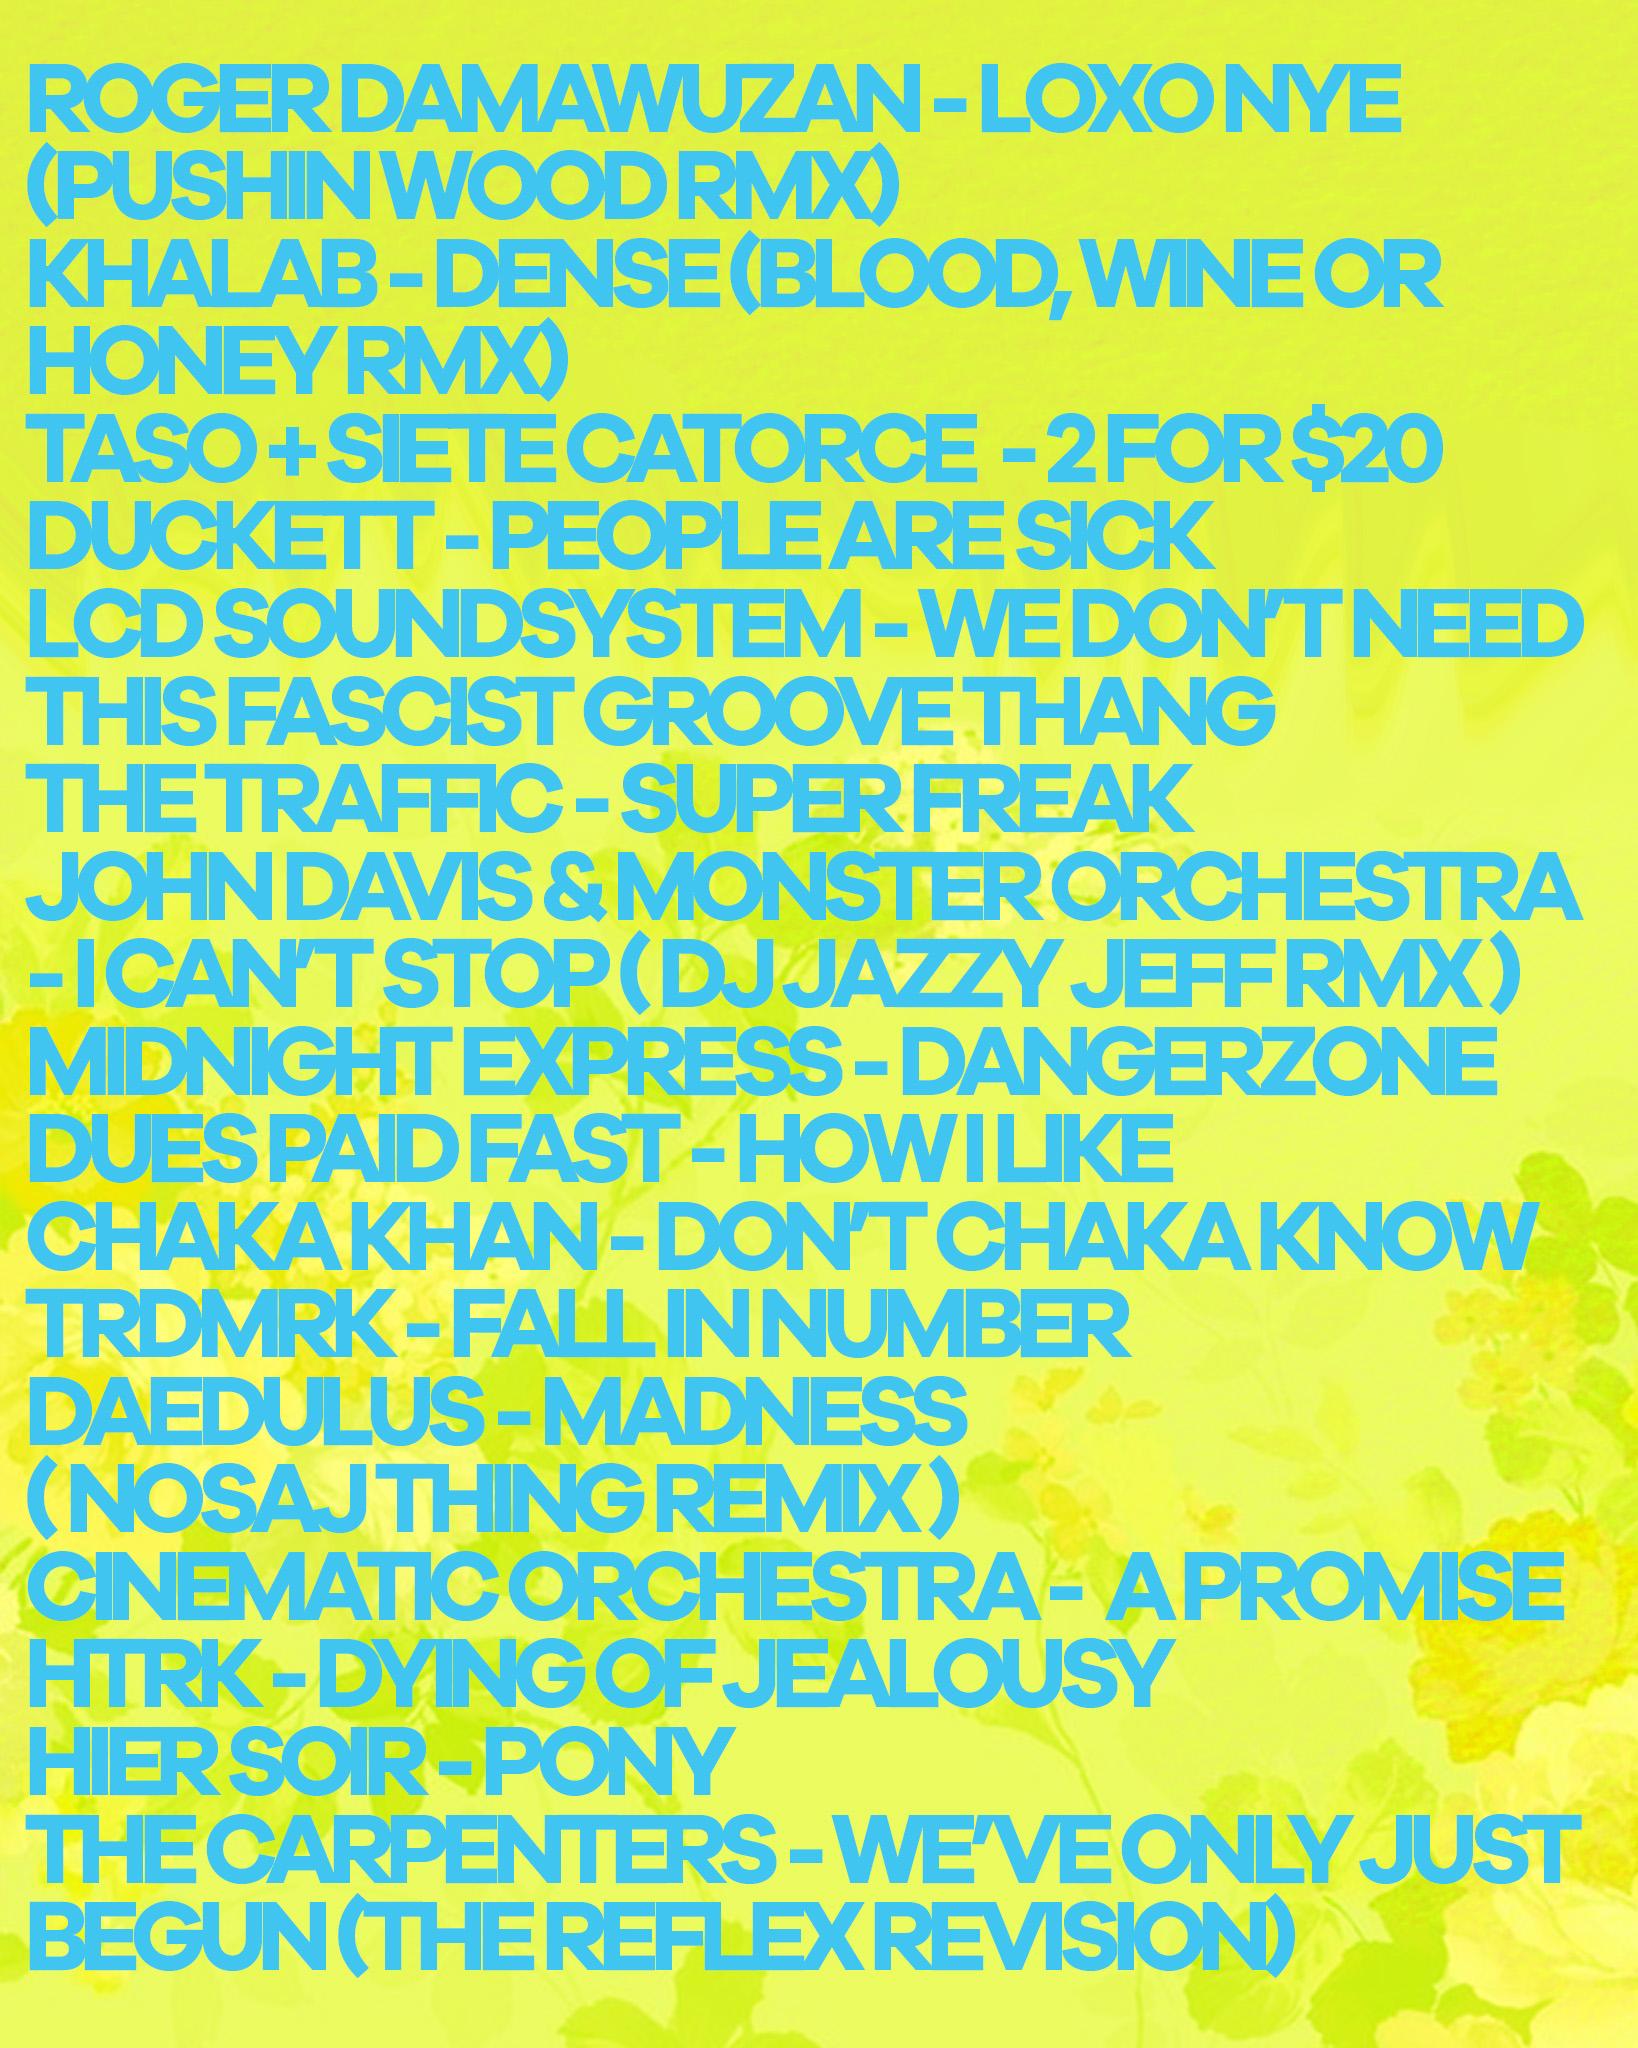 tracklist 2